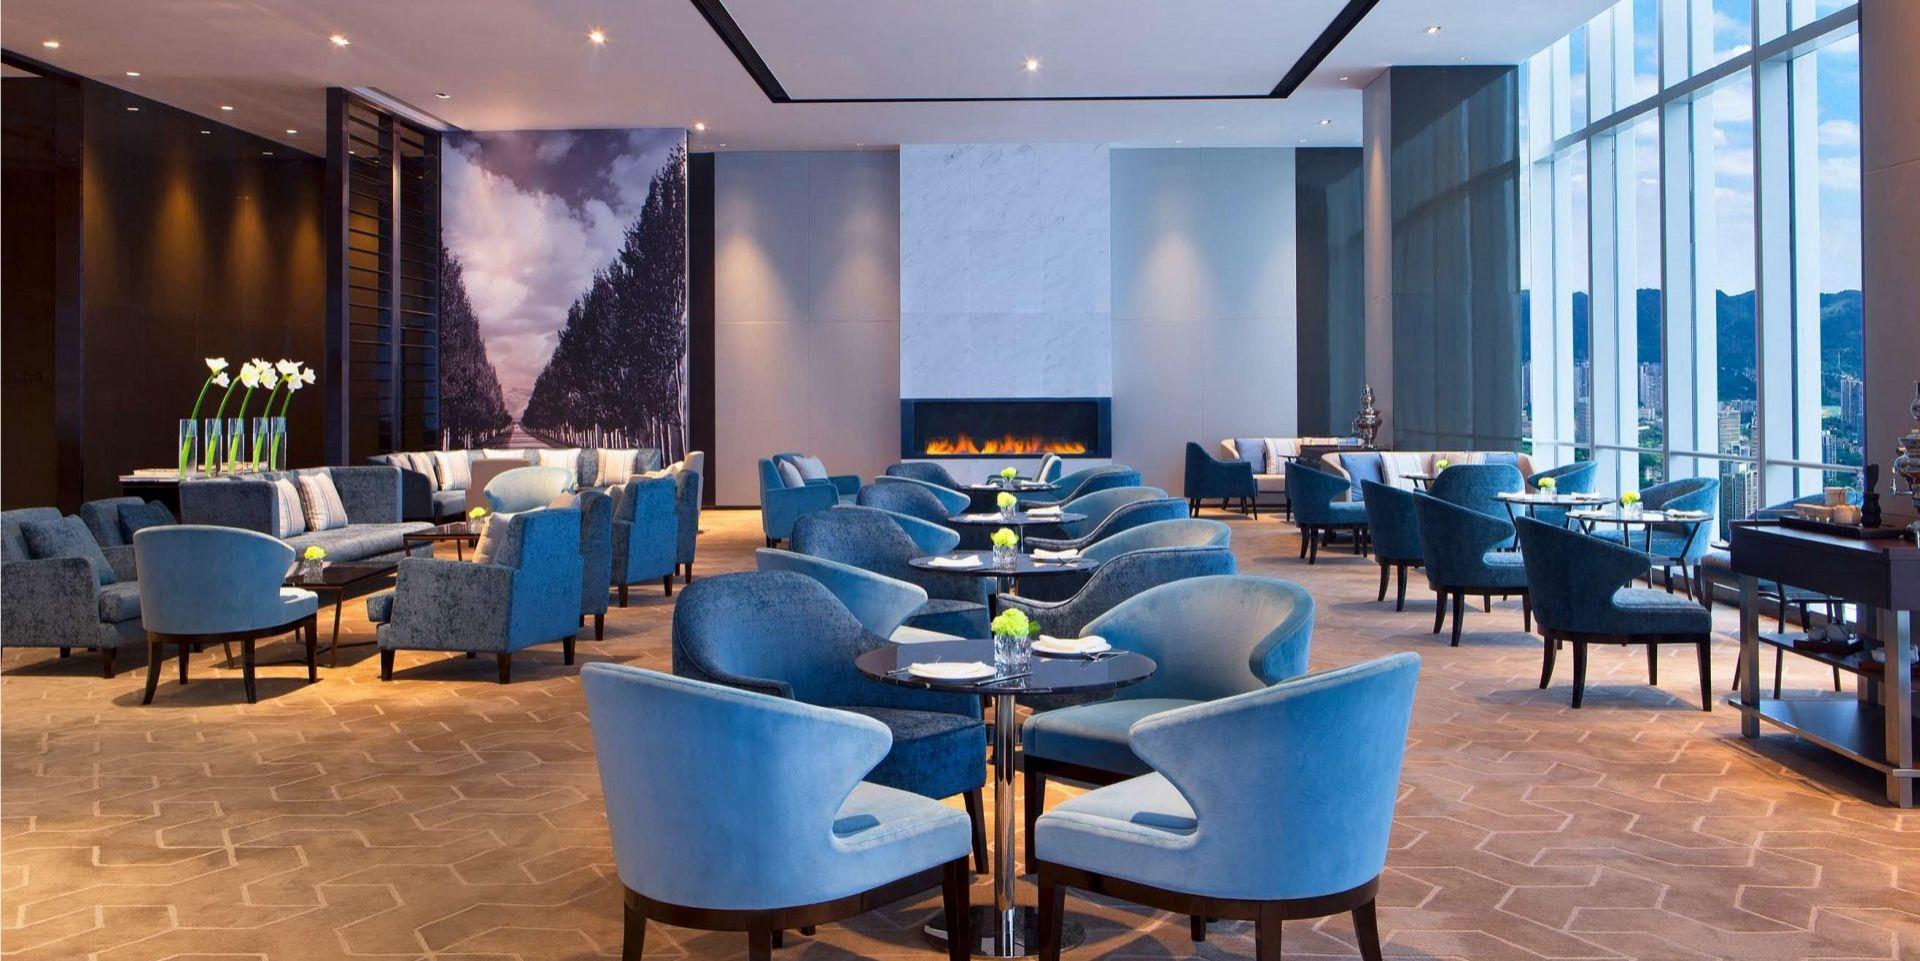 sliderimage Restaurant bar, Chinese style, Home decor